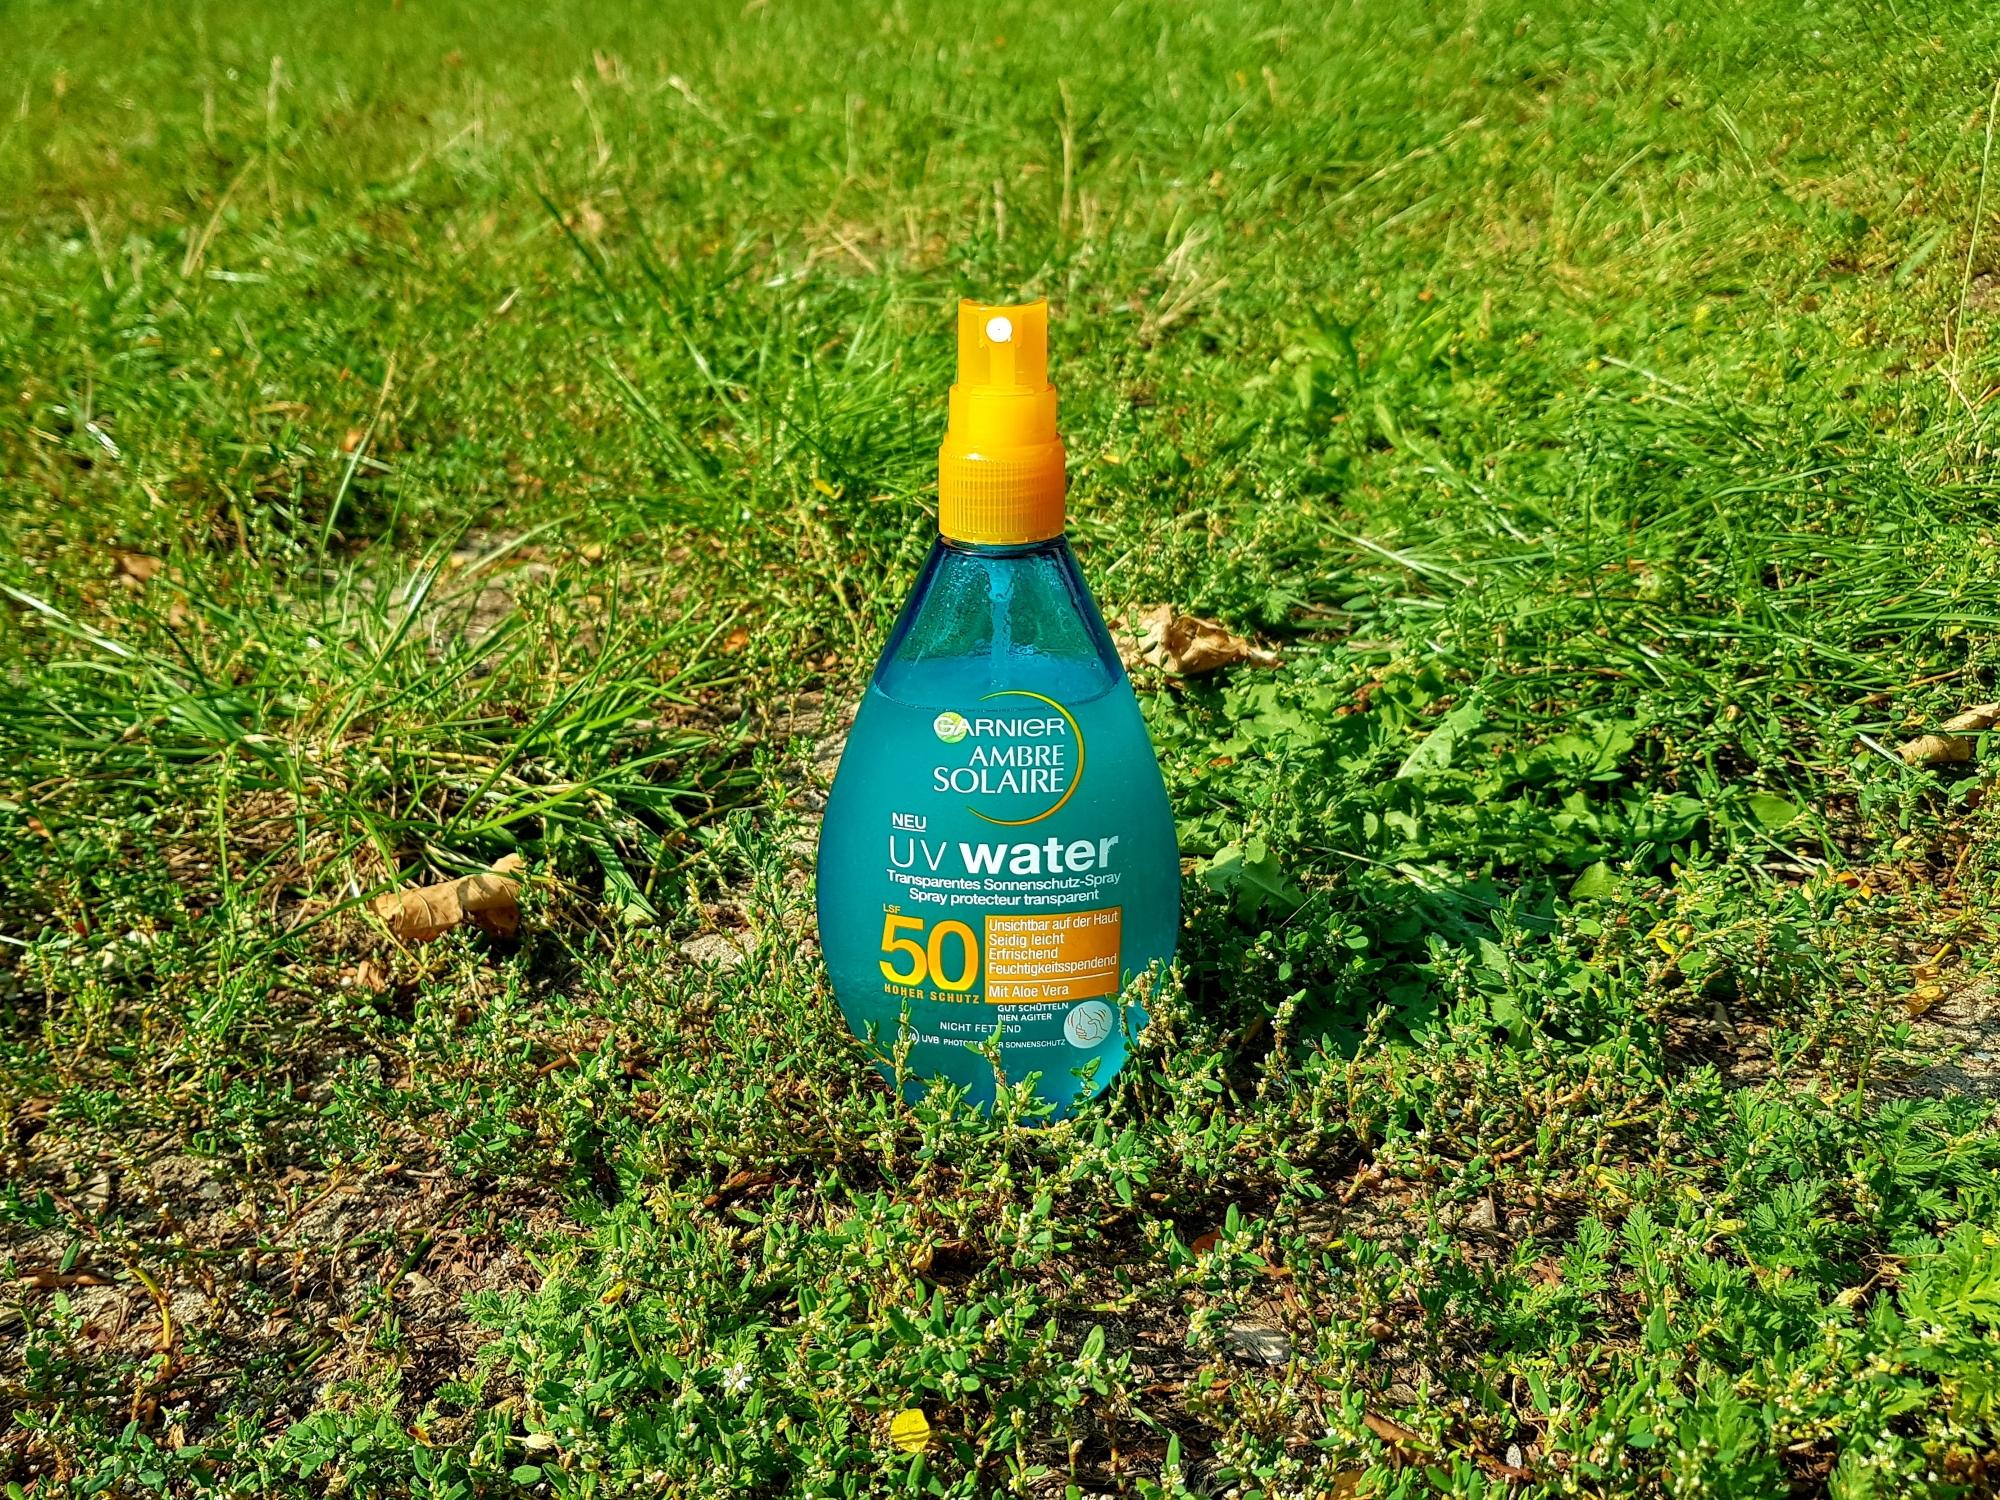 Garnier Ambre Solaire Sonnenspray UV Water LSF 50